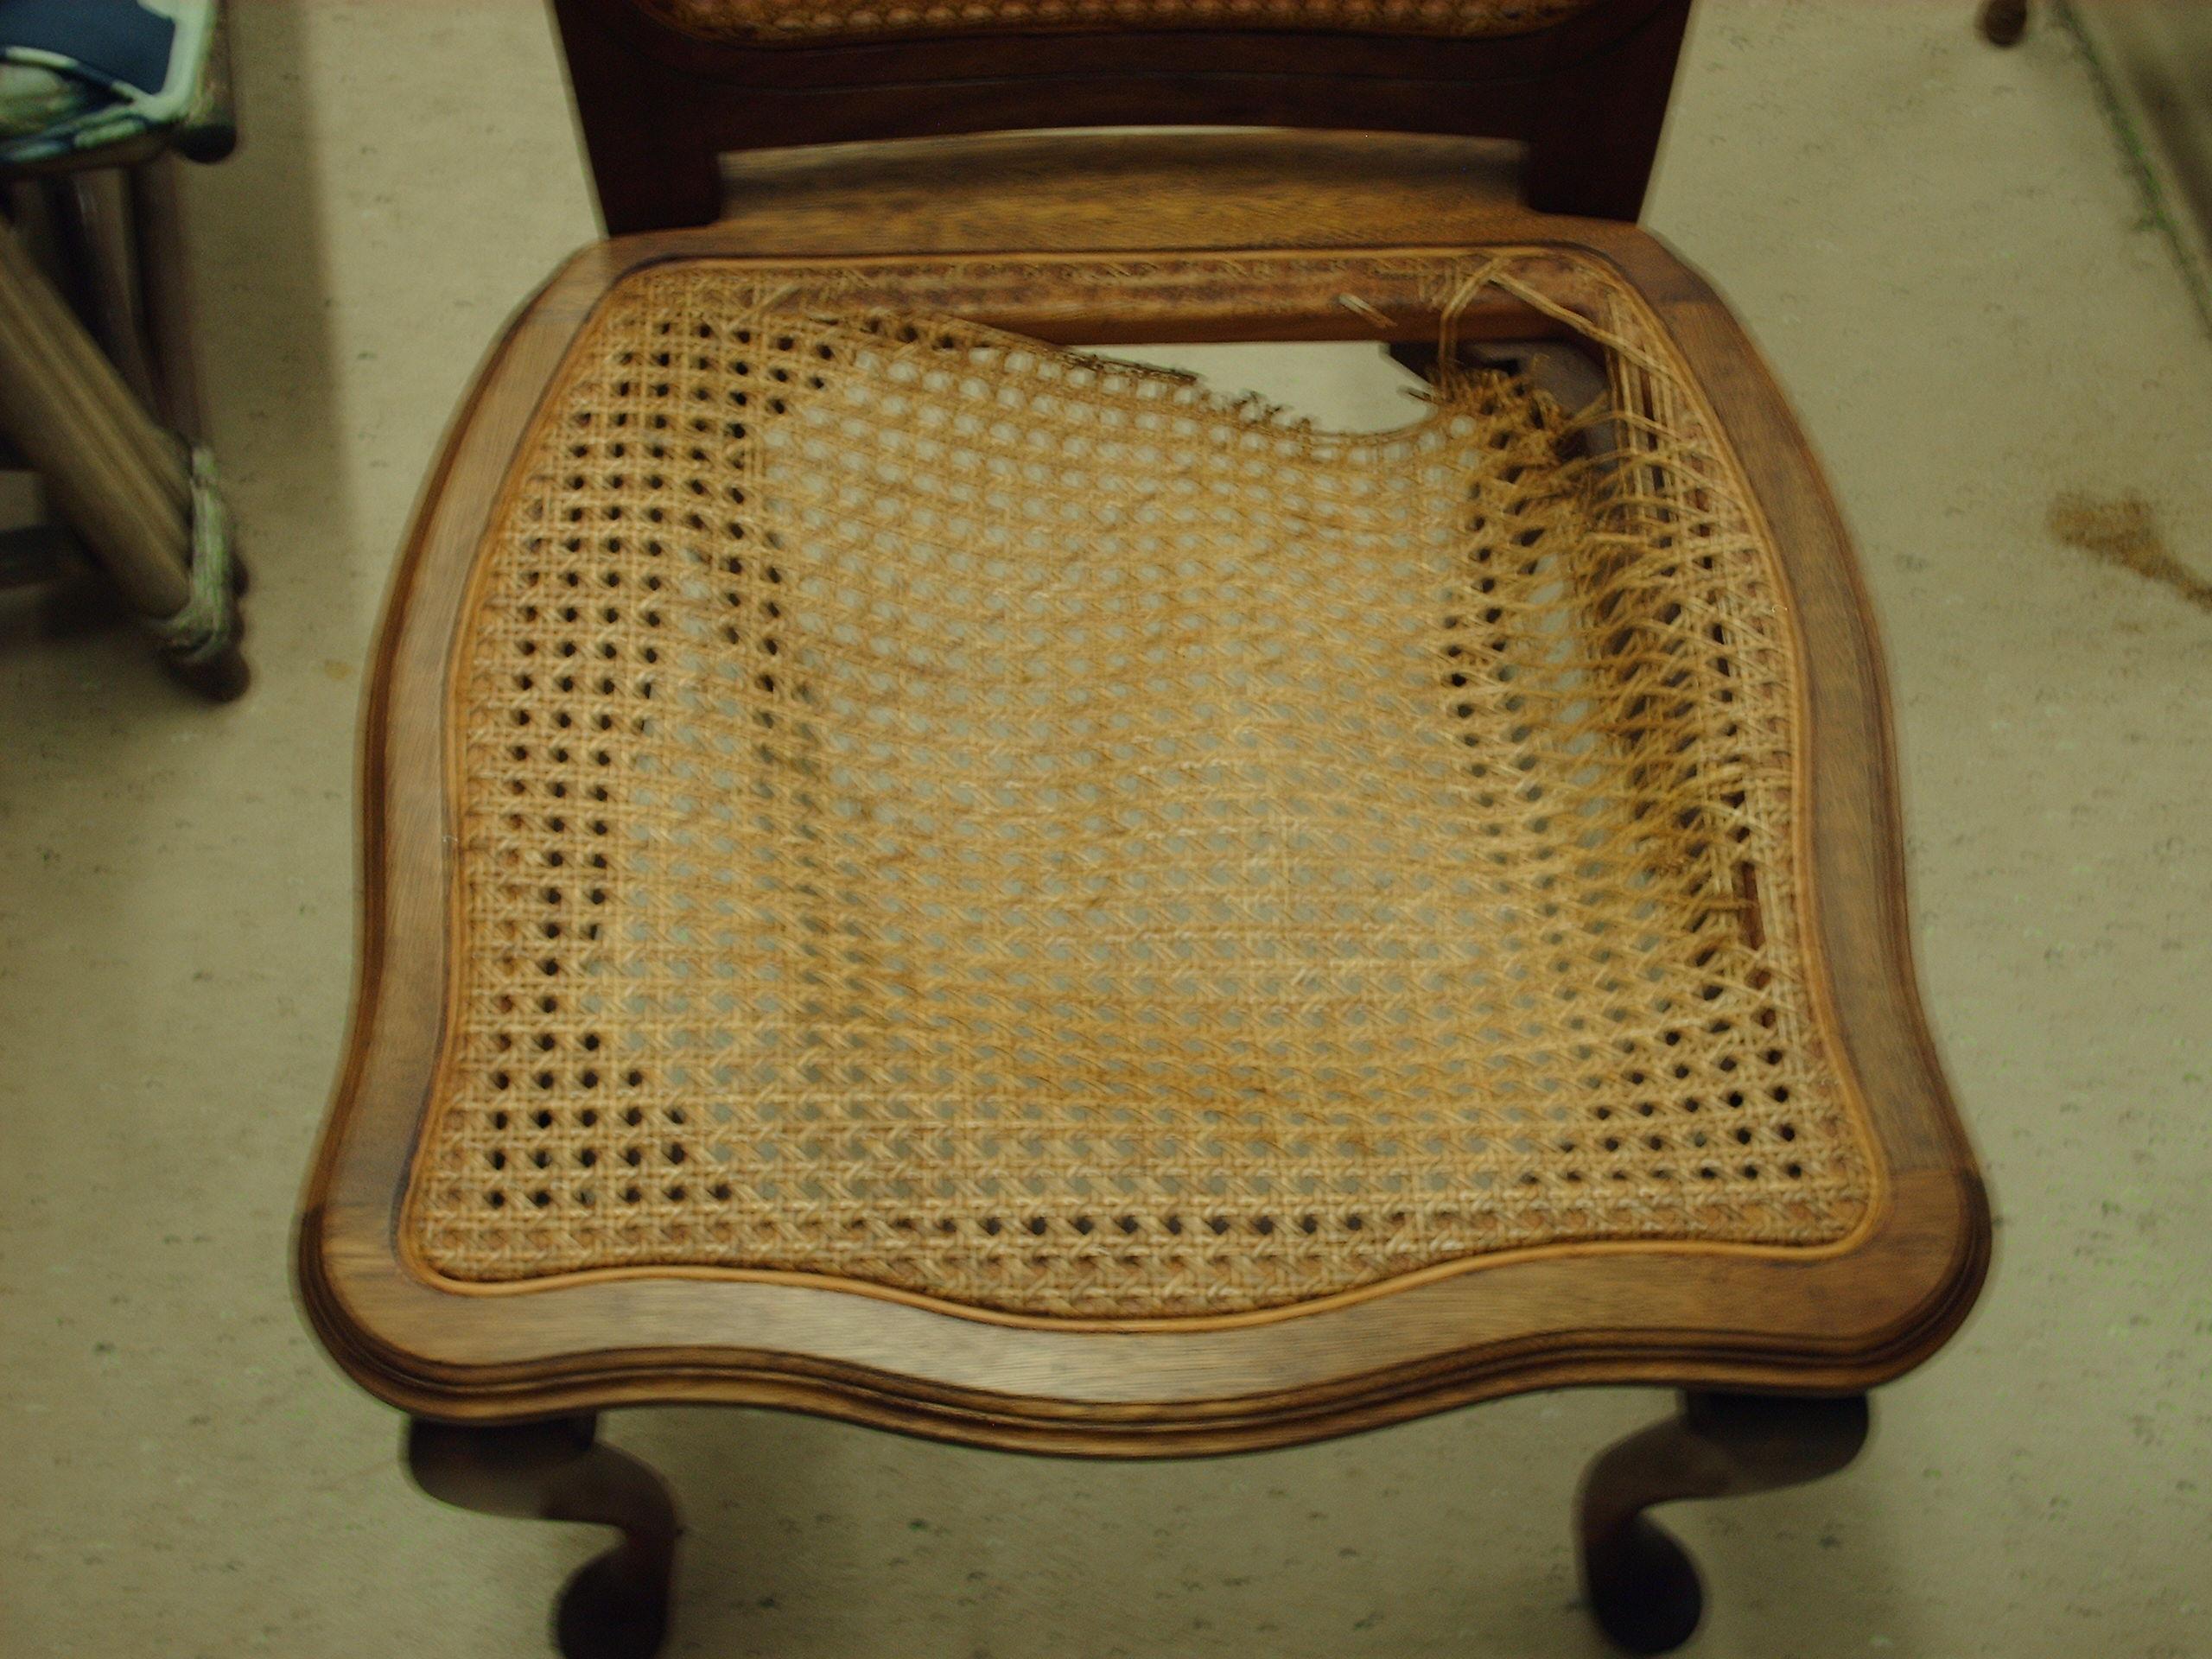 Seat Weaving Caning Heritage Basket Studio Amp Chair